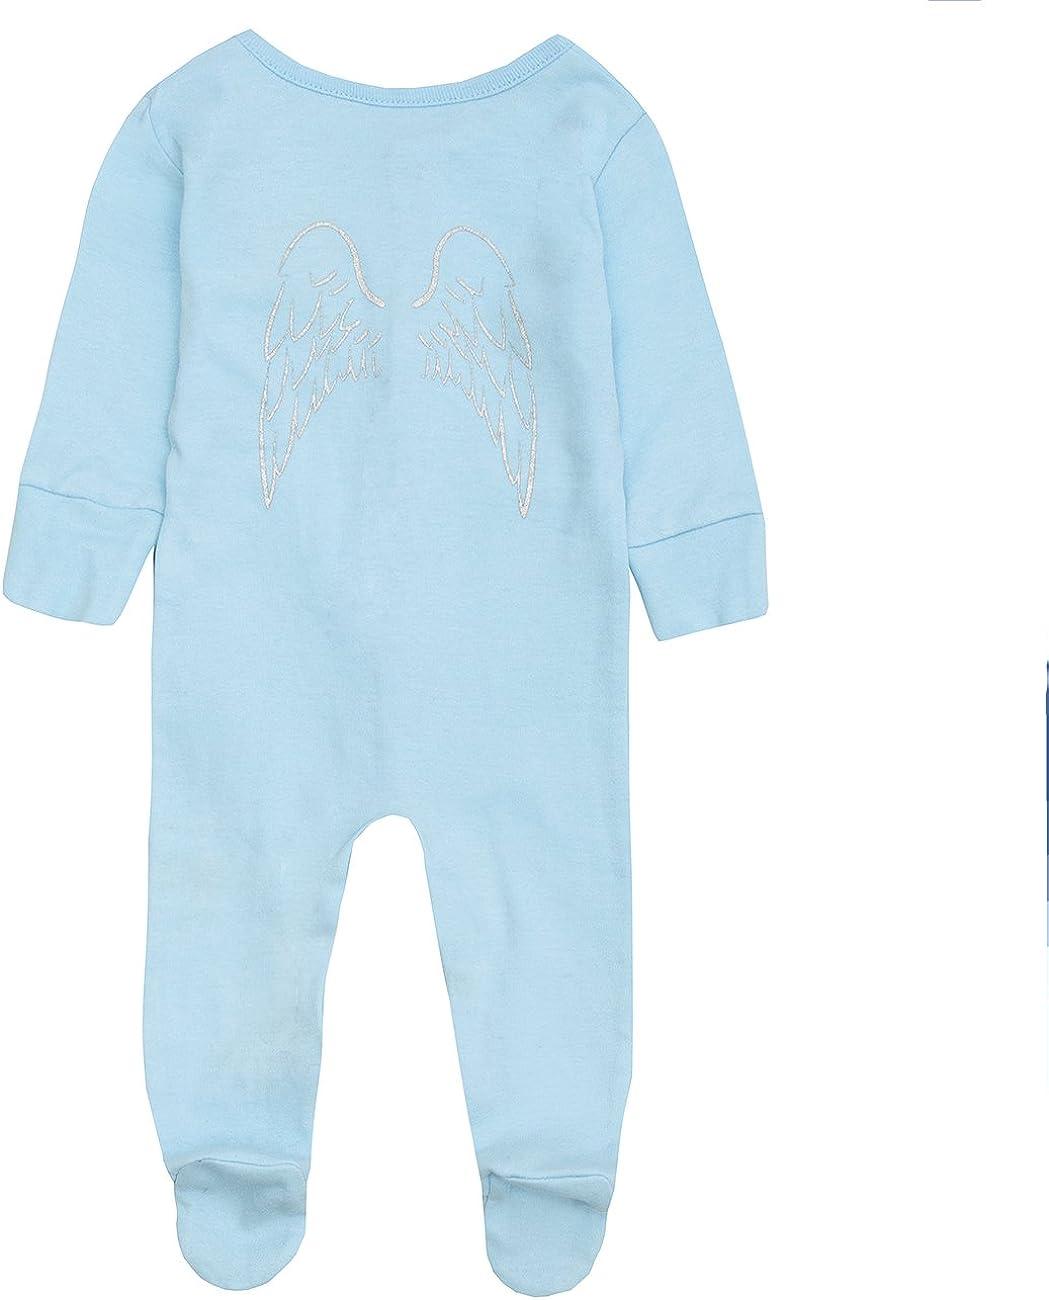 BABY TOWN Babytown Babies Little Angel Sleepsuit